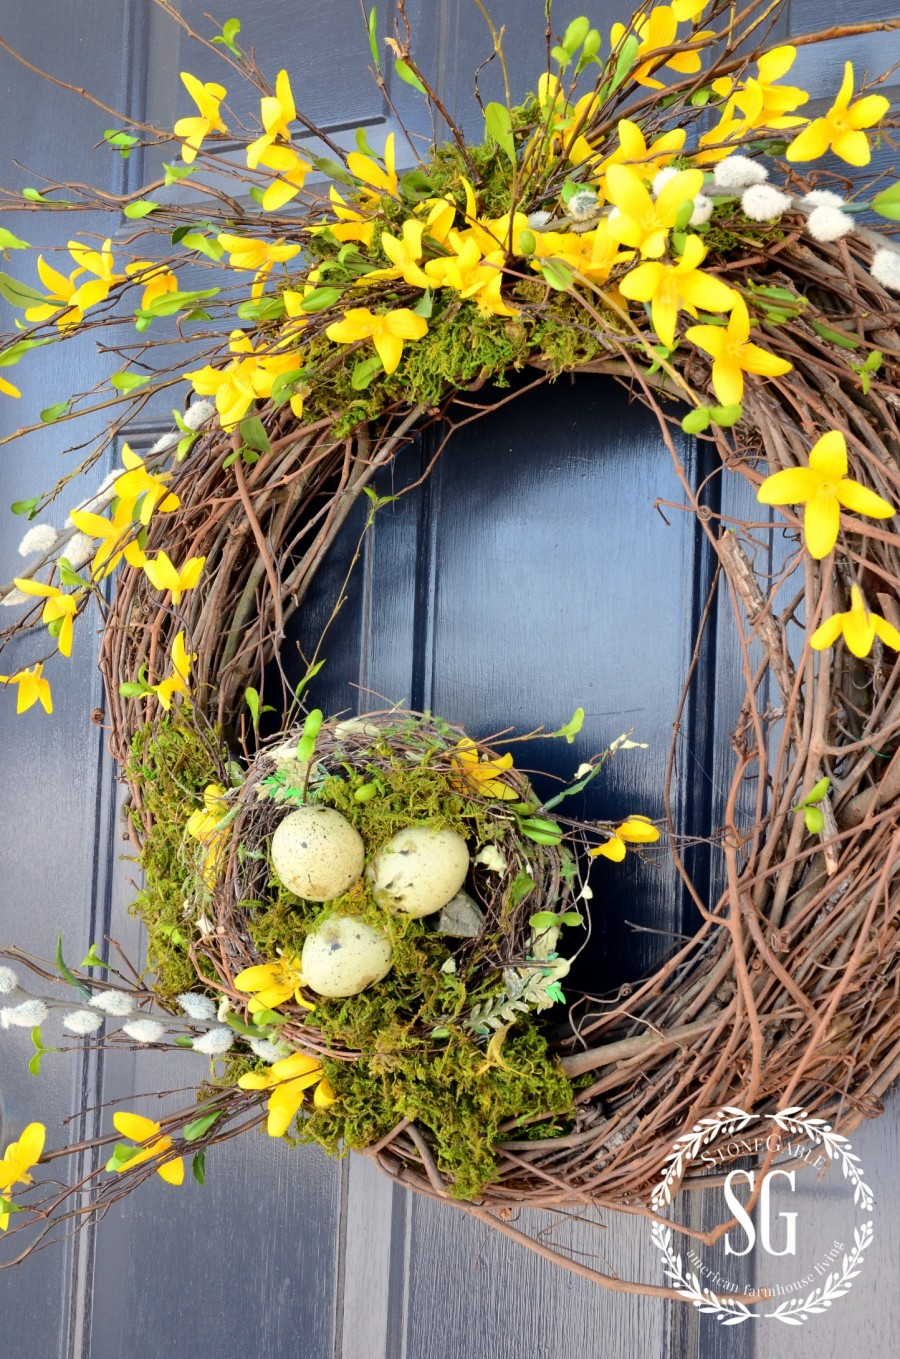 5 QUESTIONS YOU ASKED STONEGABLE-door color-forsythia wreath-stonegableblog.com